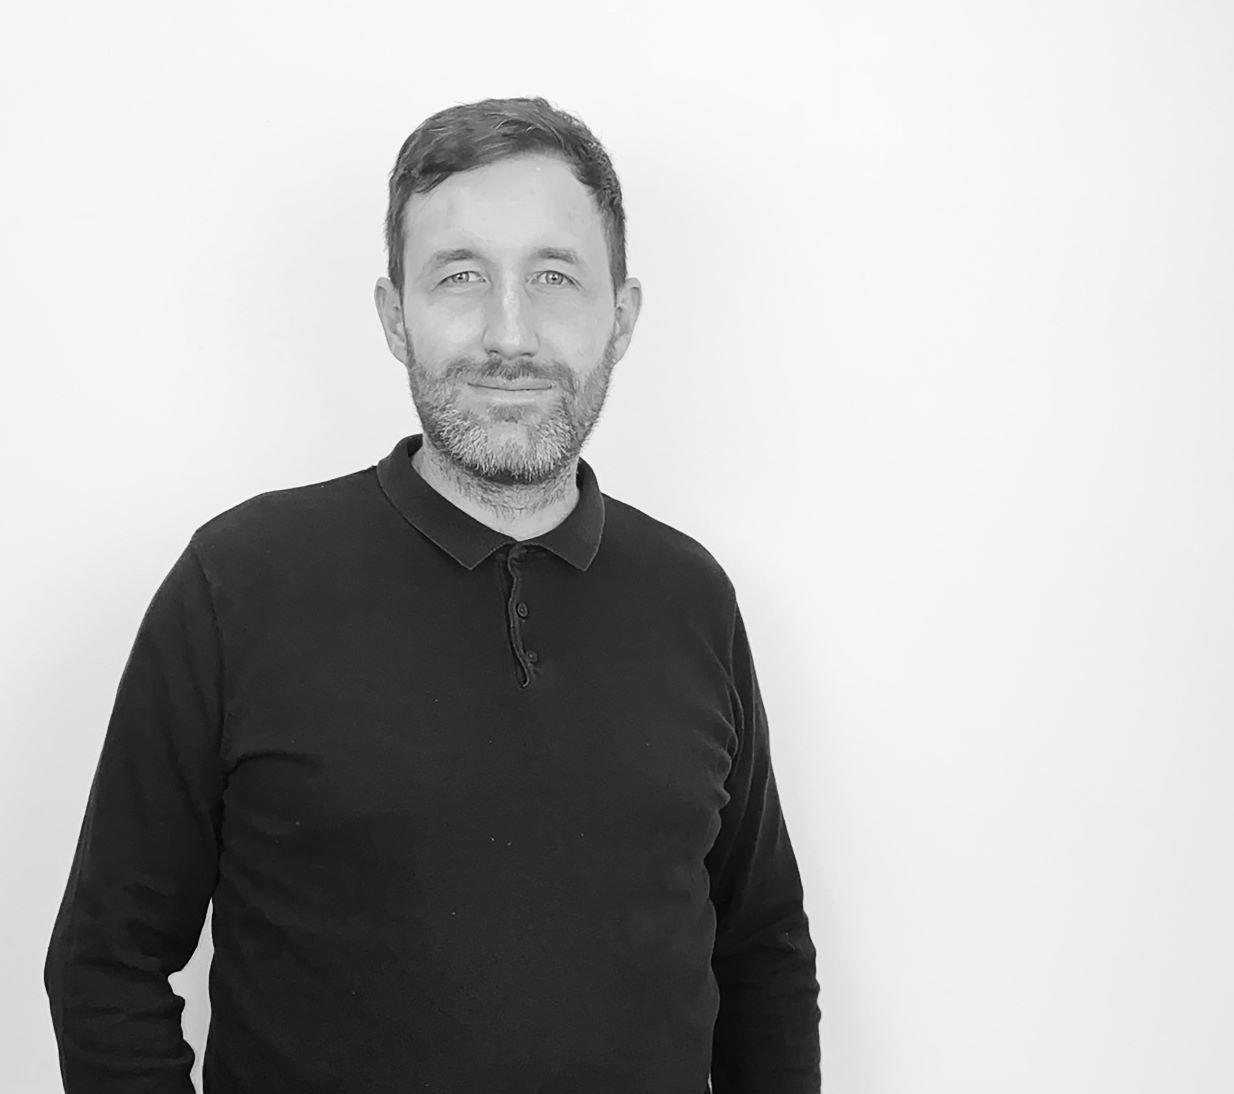 Image of Neil Kirk